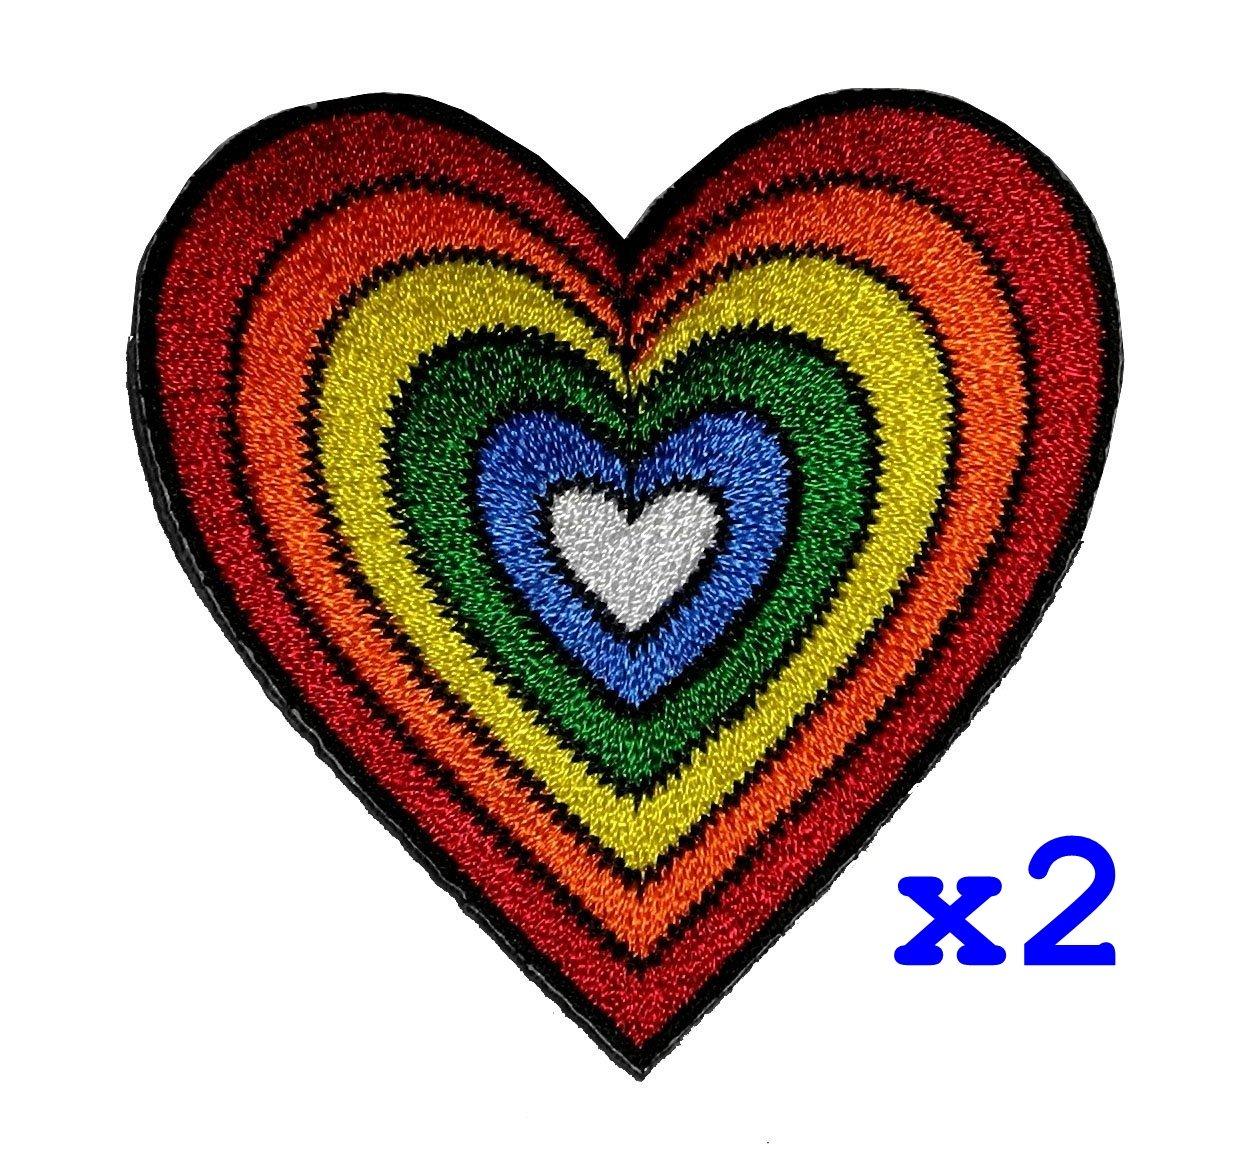 Heart Rainbow Hippie Retro Design DIY Applique Embroidered Sew Iron on Patch H-01 PA International Trading Co. Ltd 4337021918